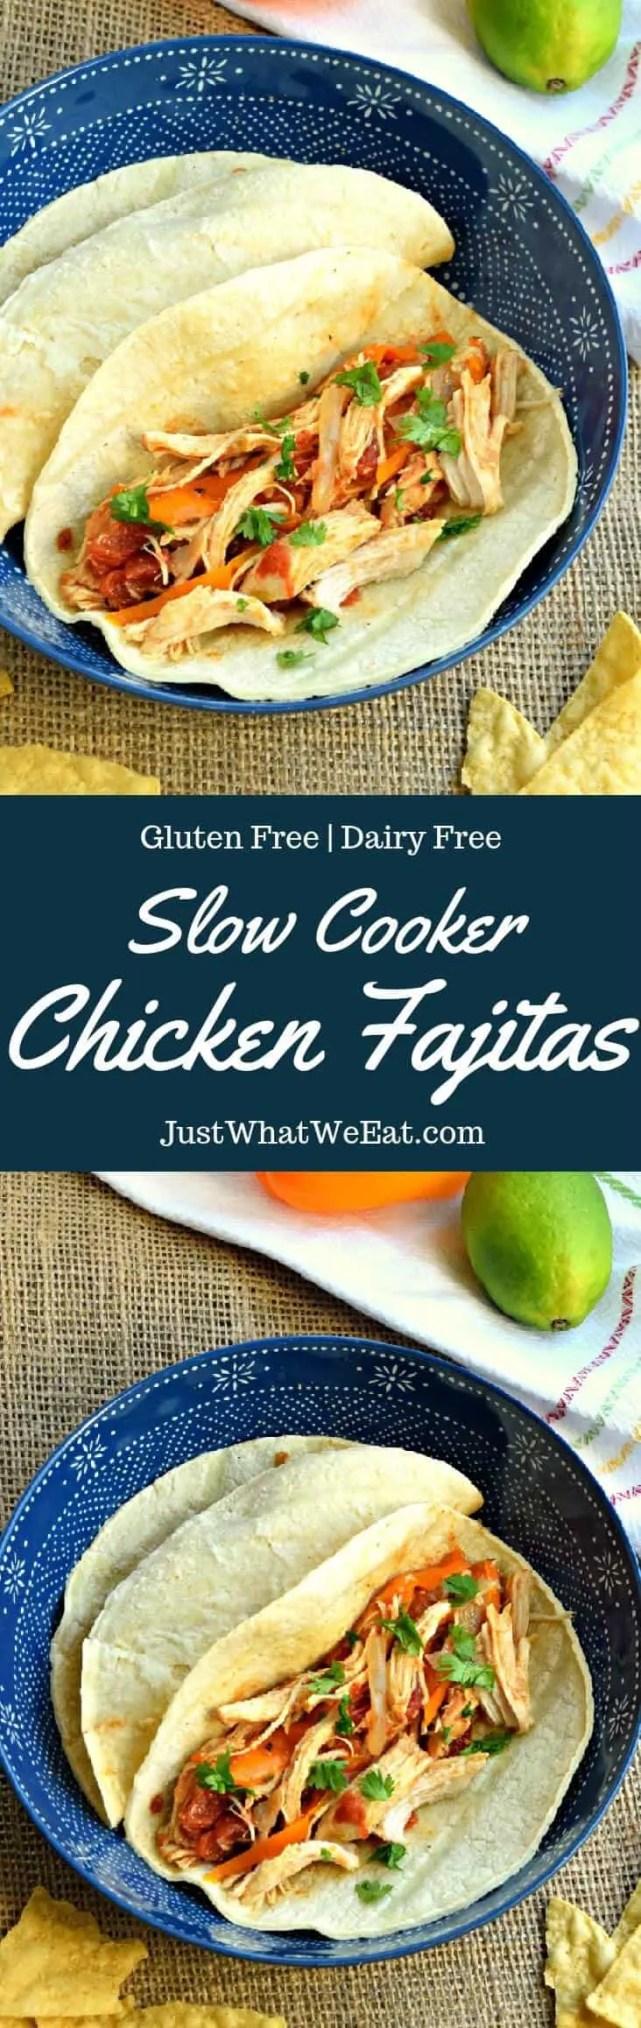 Slow Cooker Chicken Fajitas - Gluten Free & Dairy Free